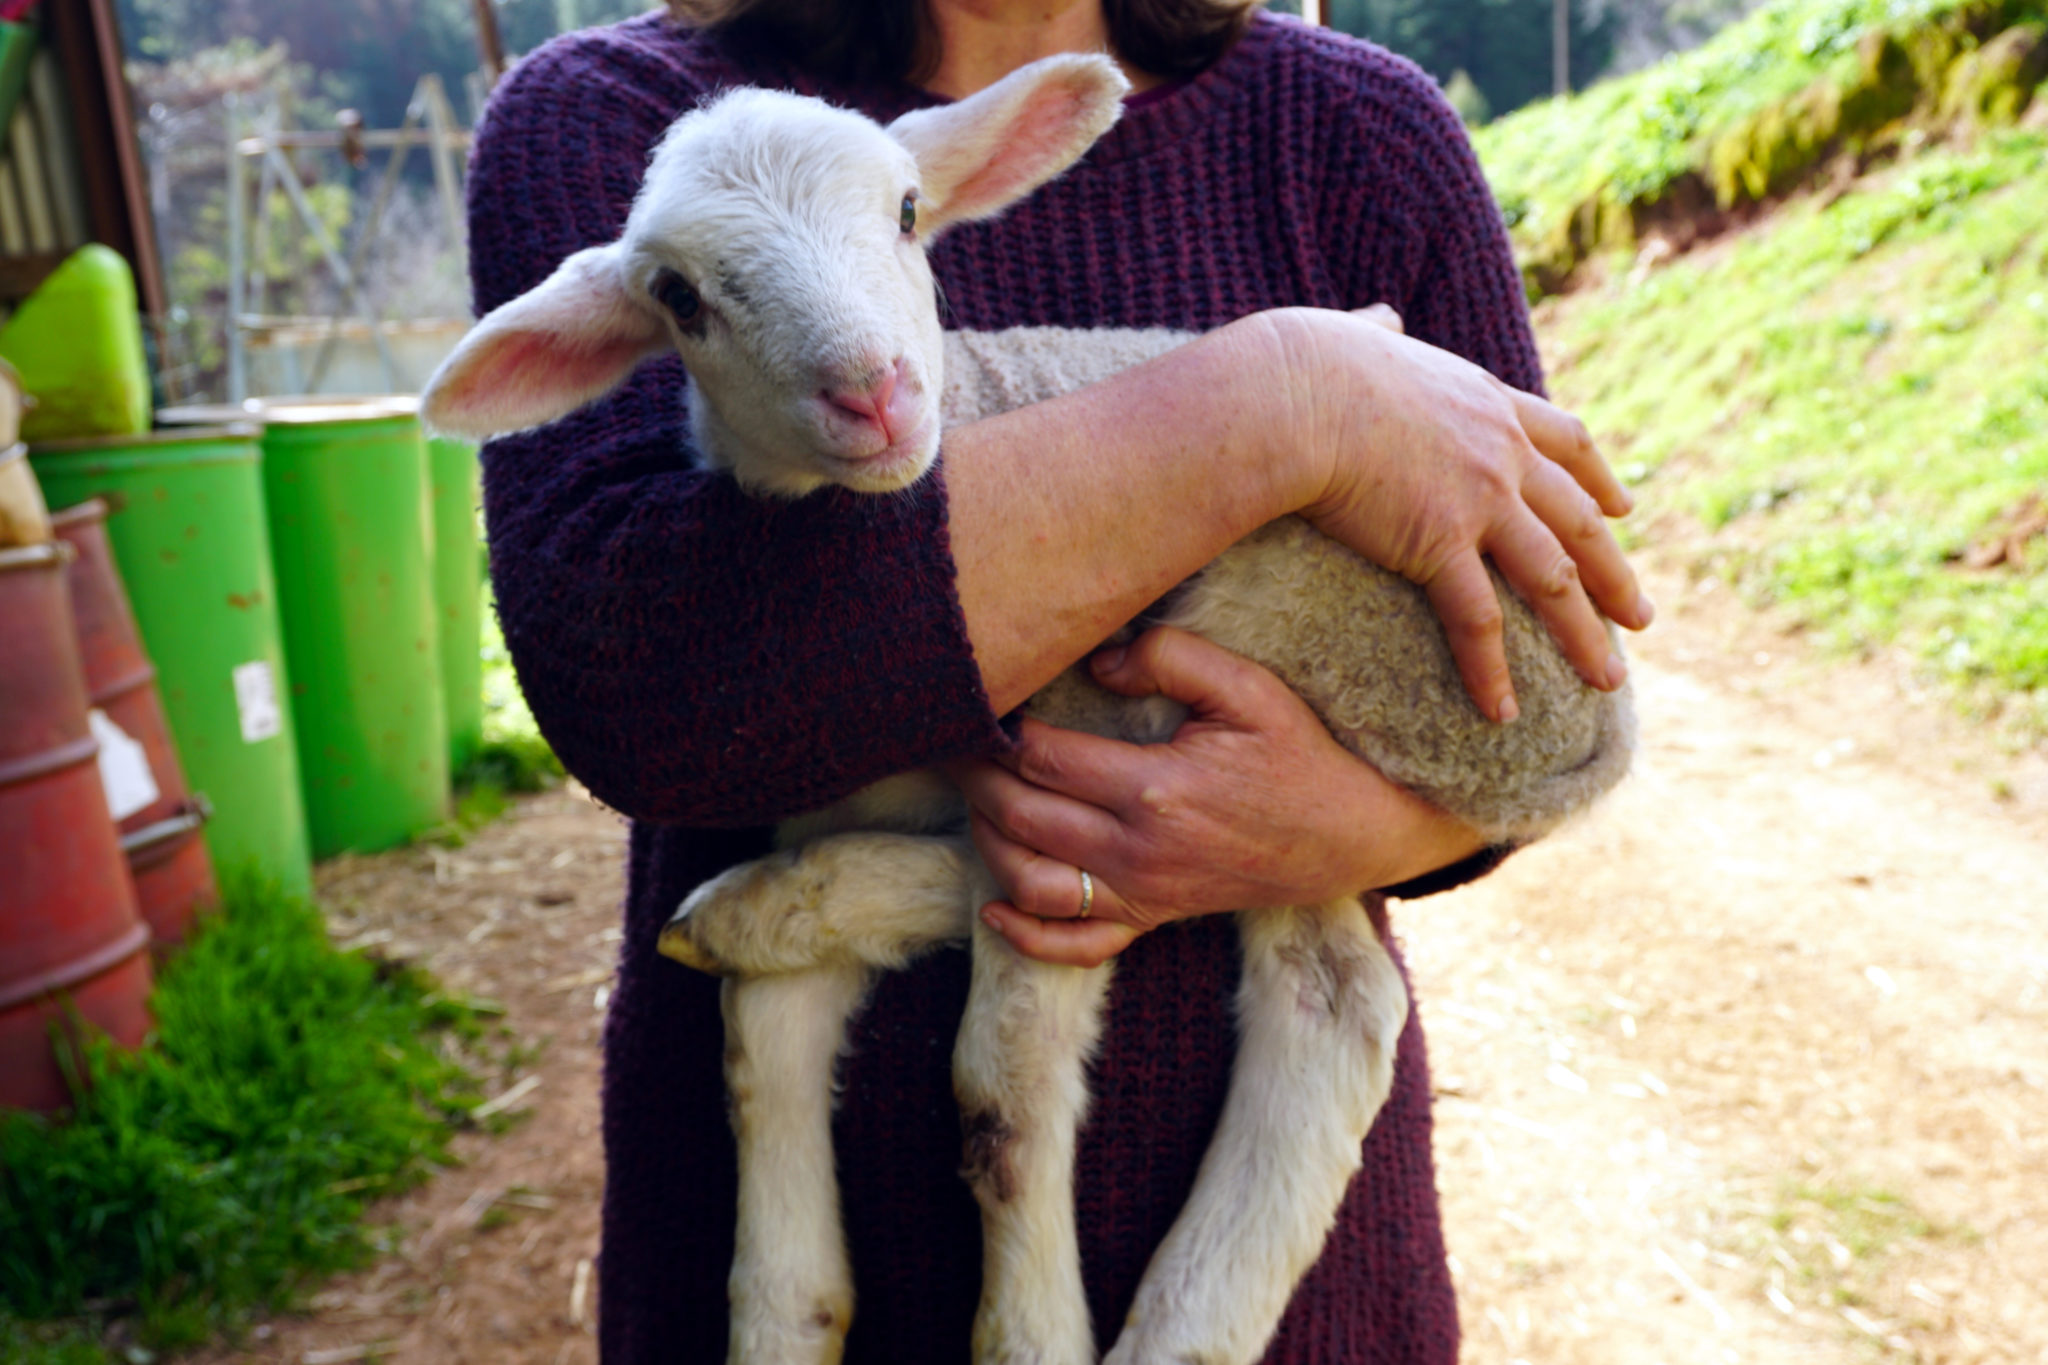 Baby-Lämmchen ins Lynns Armen